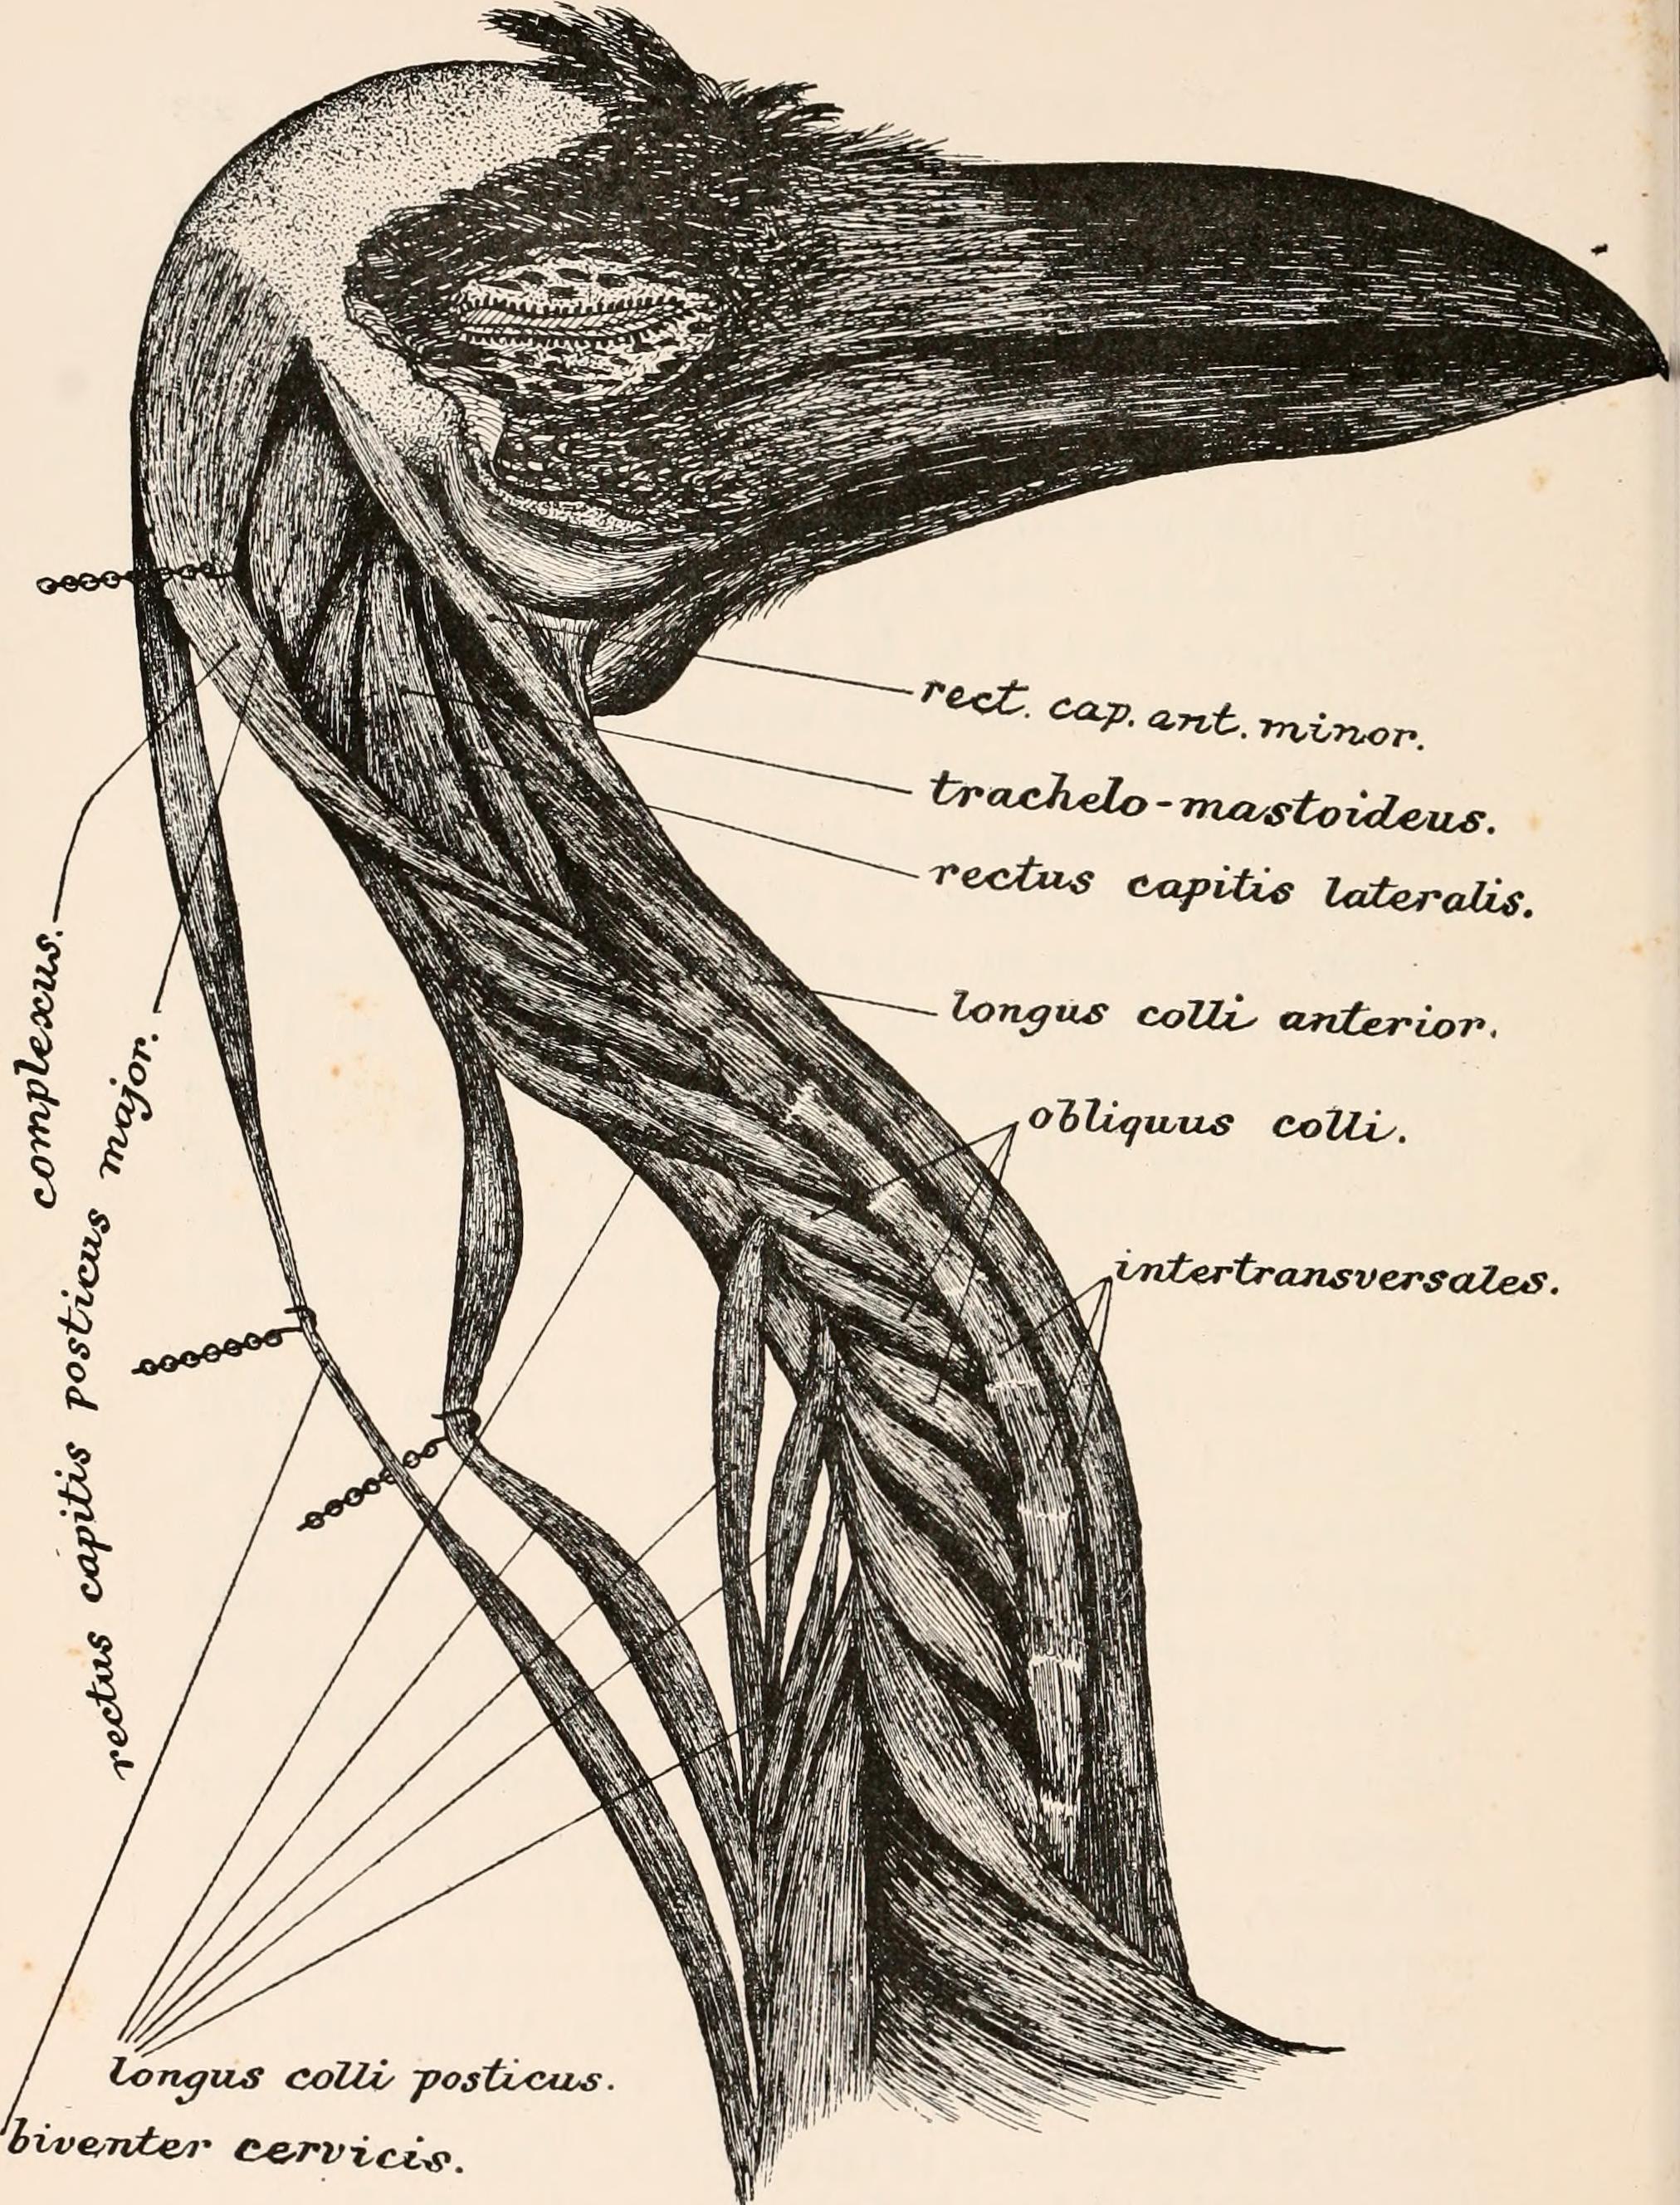 Corvus corax sinuatus